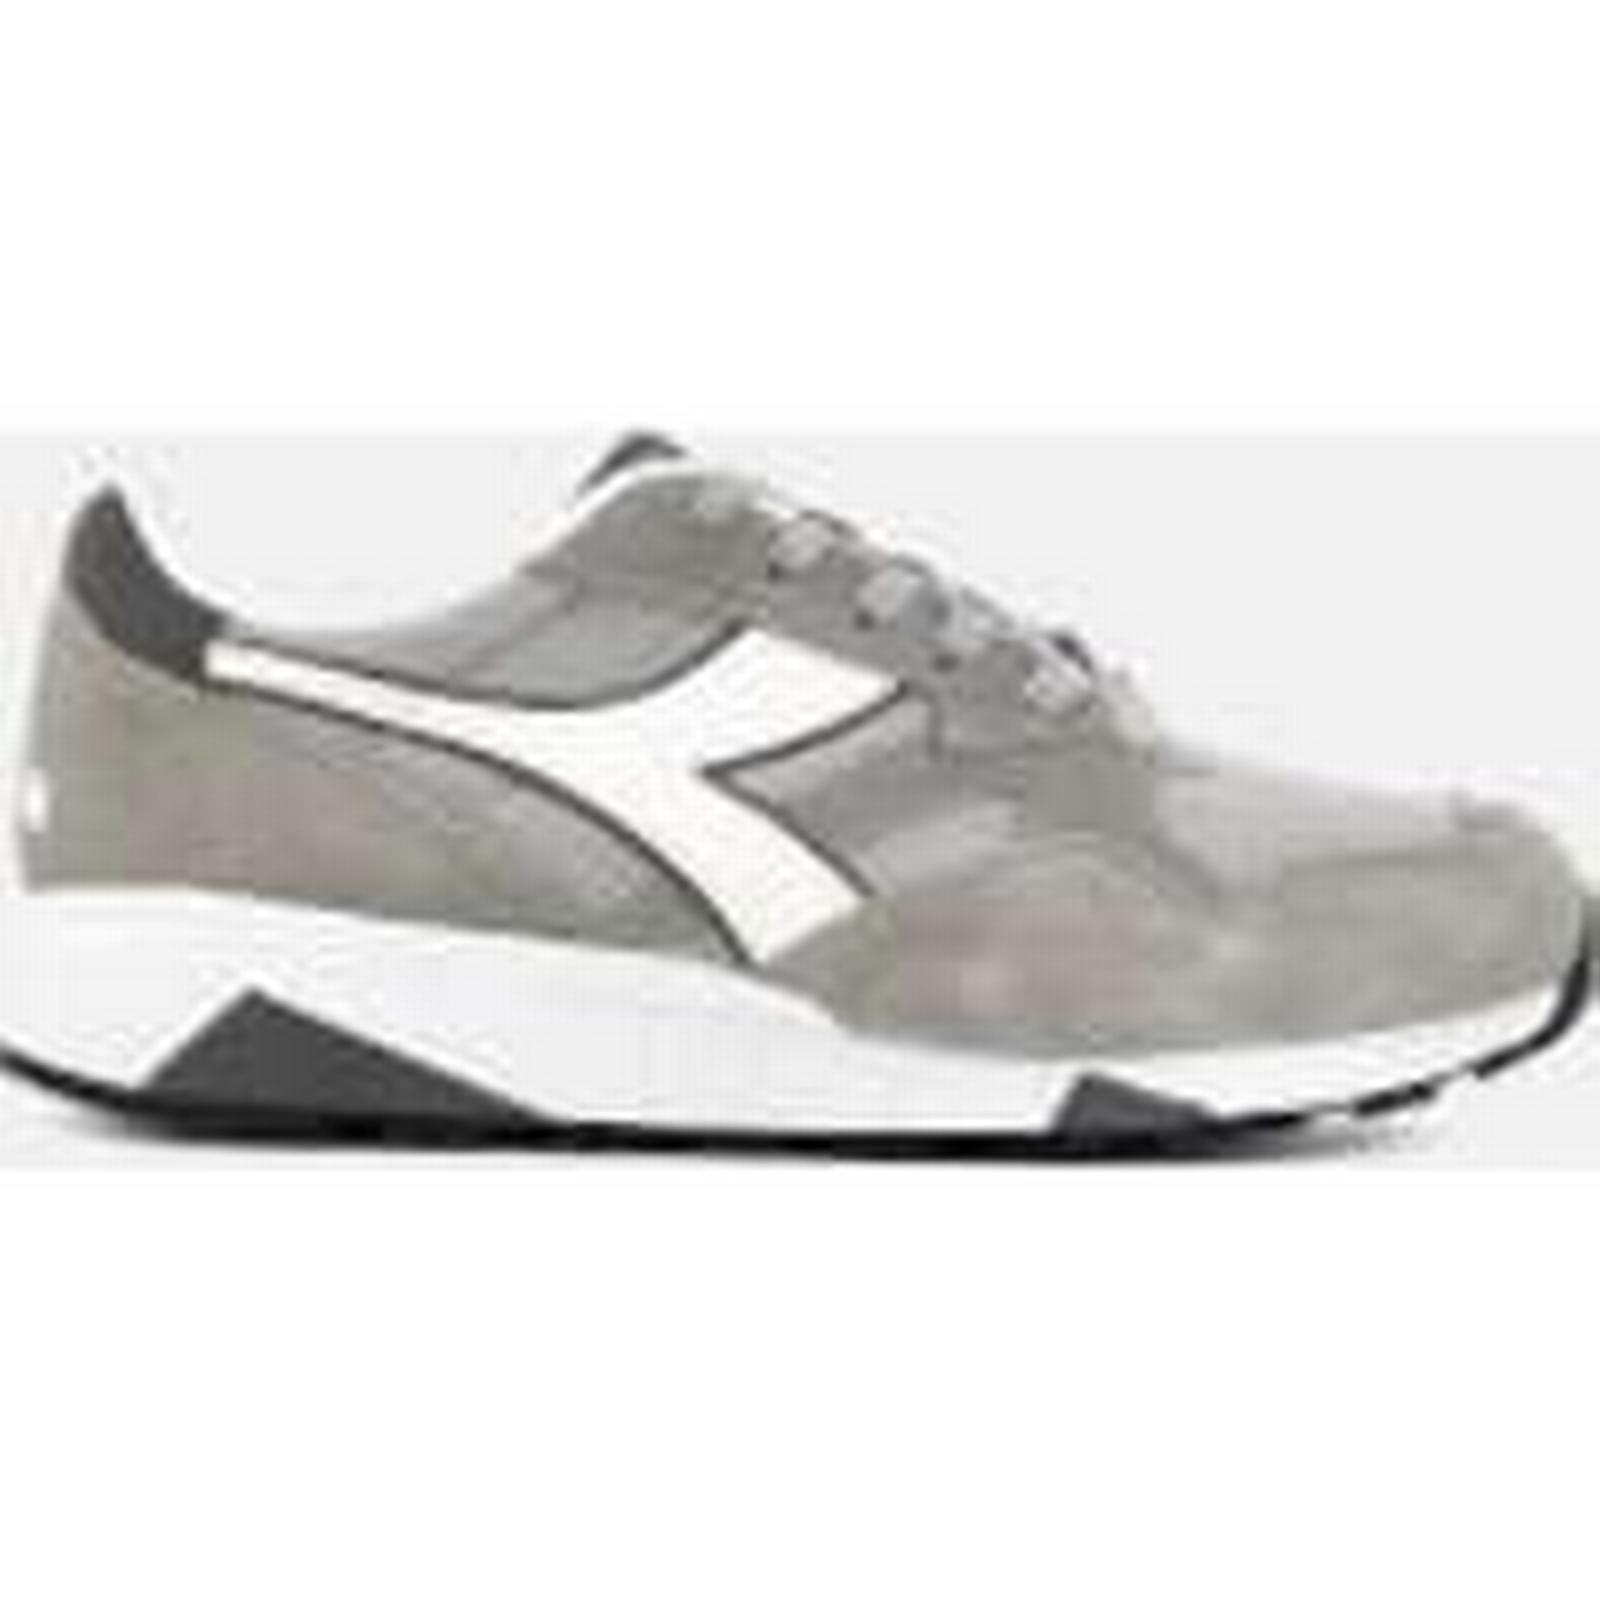 Diadora Men's N902 S Nylon/Suede - Trainers - Paloma Grey - Nylon/Suede UK 10 - Grey d87ae1